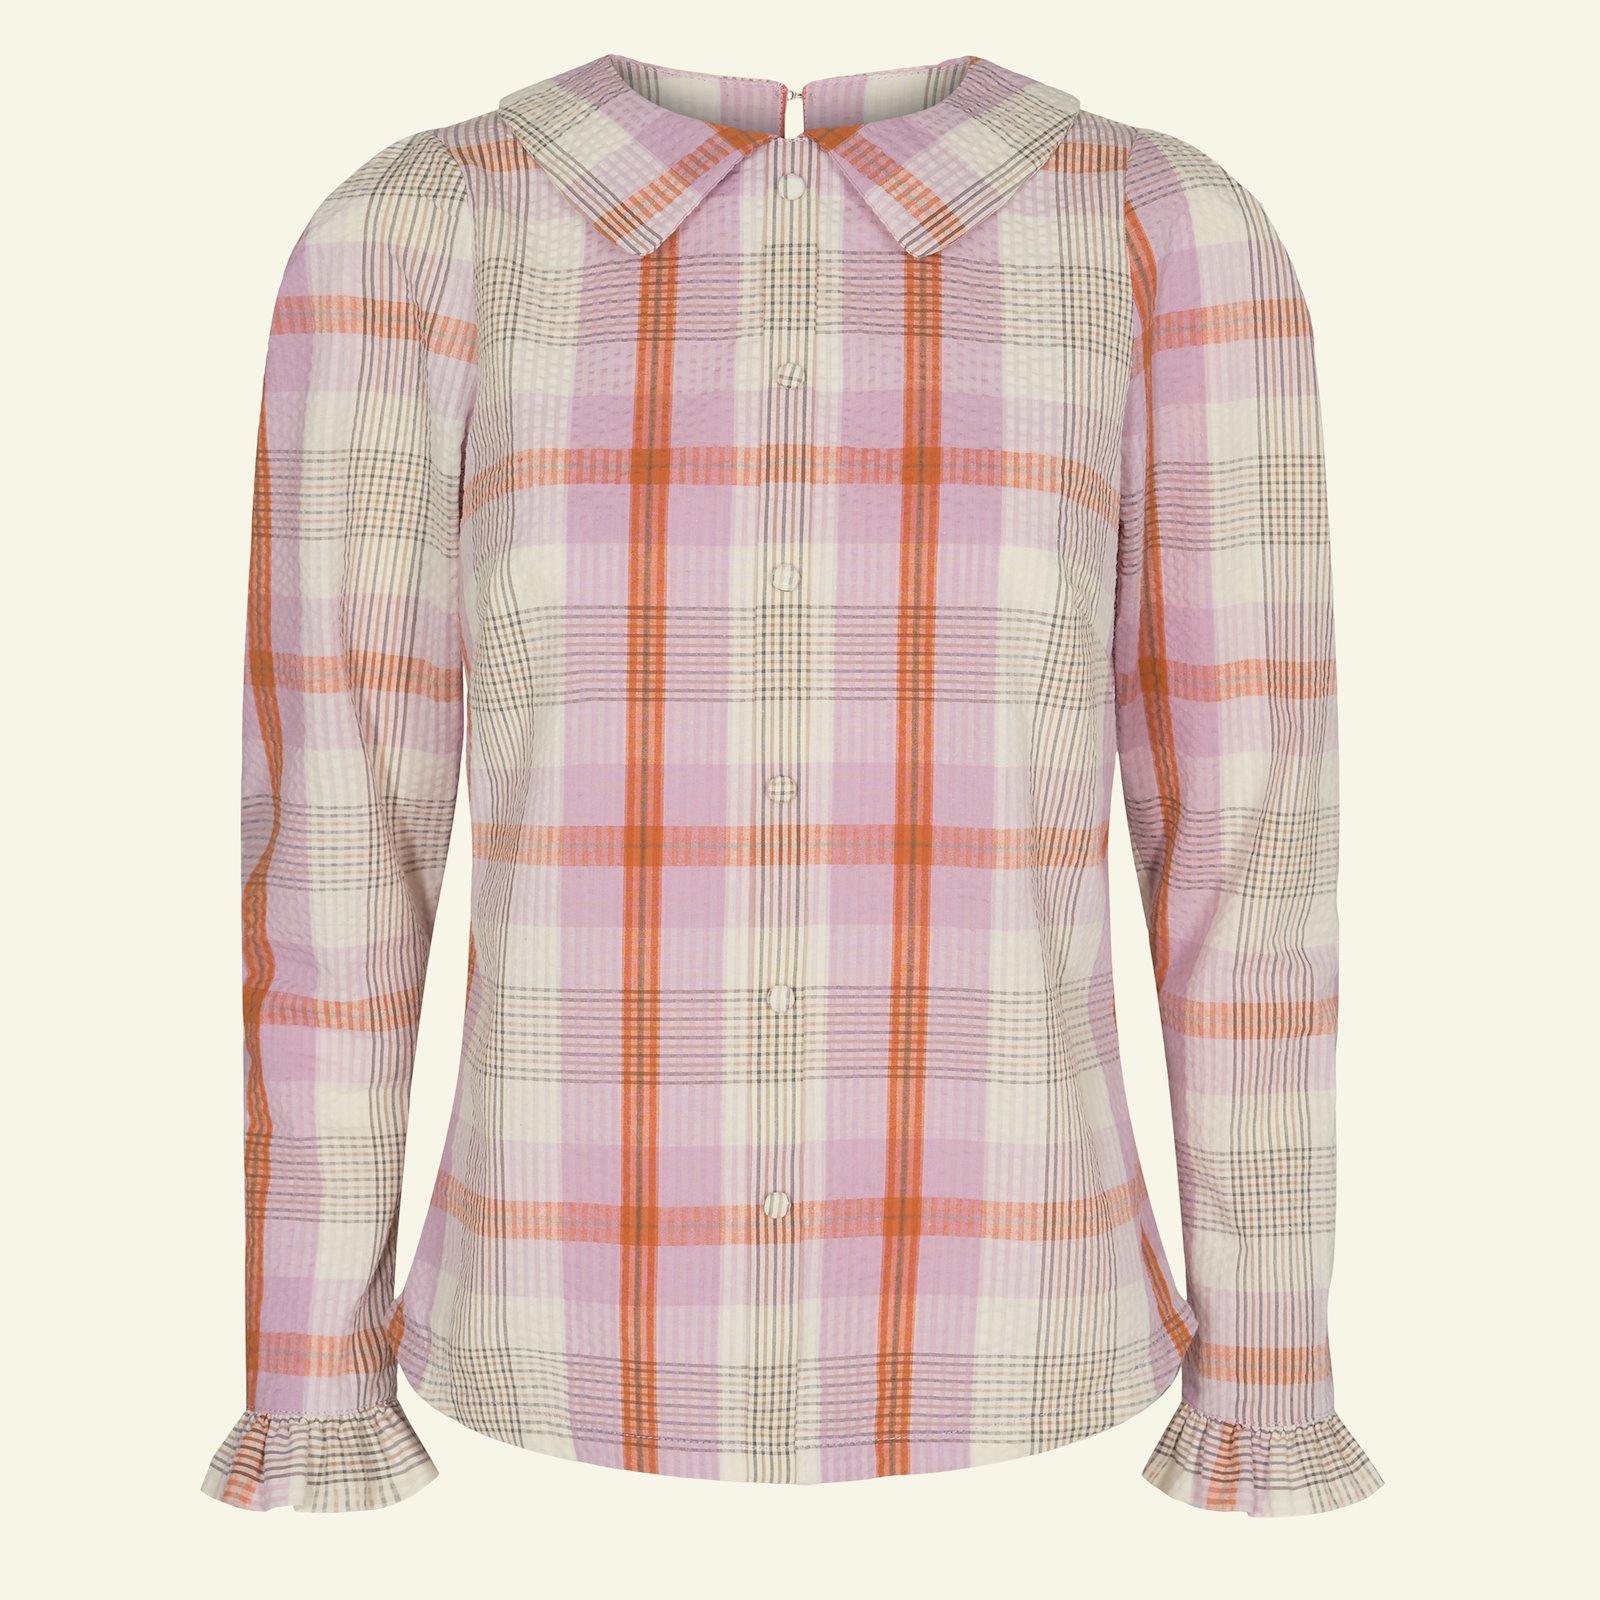 Design your own blouse, 44/16 p22075_580050_43591_sskit